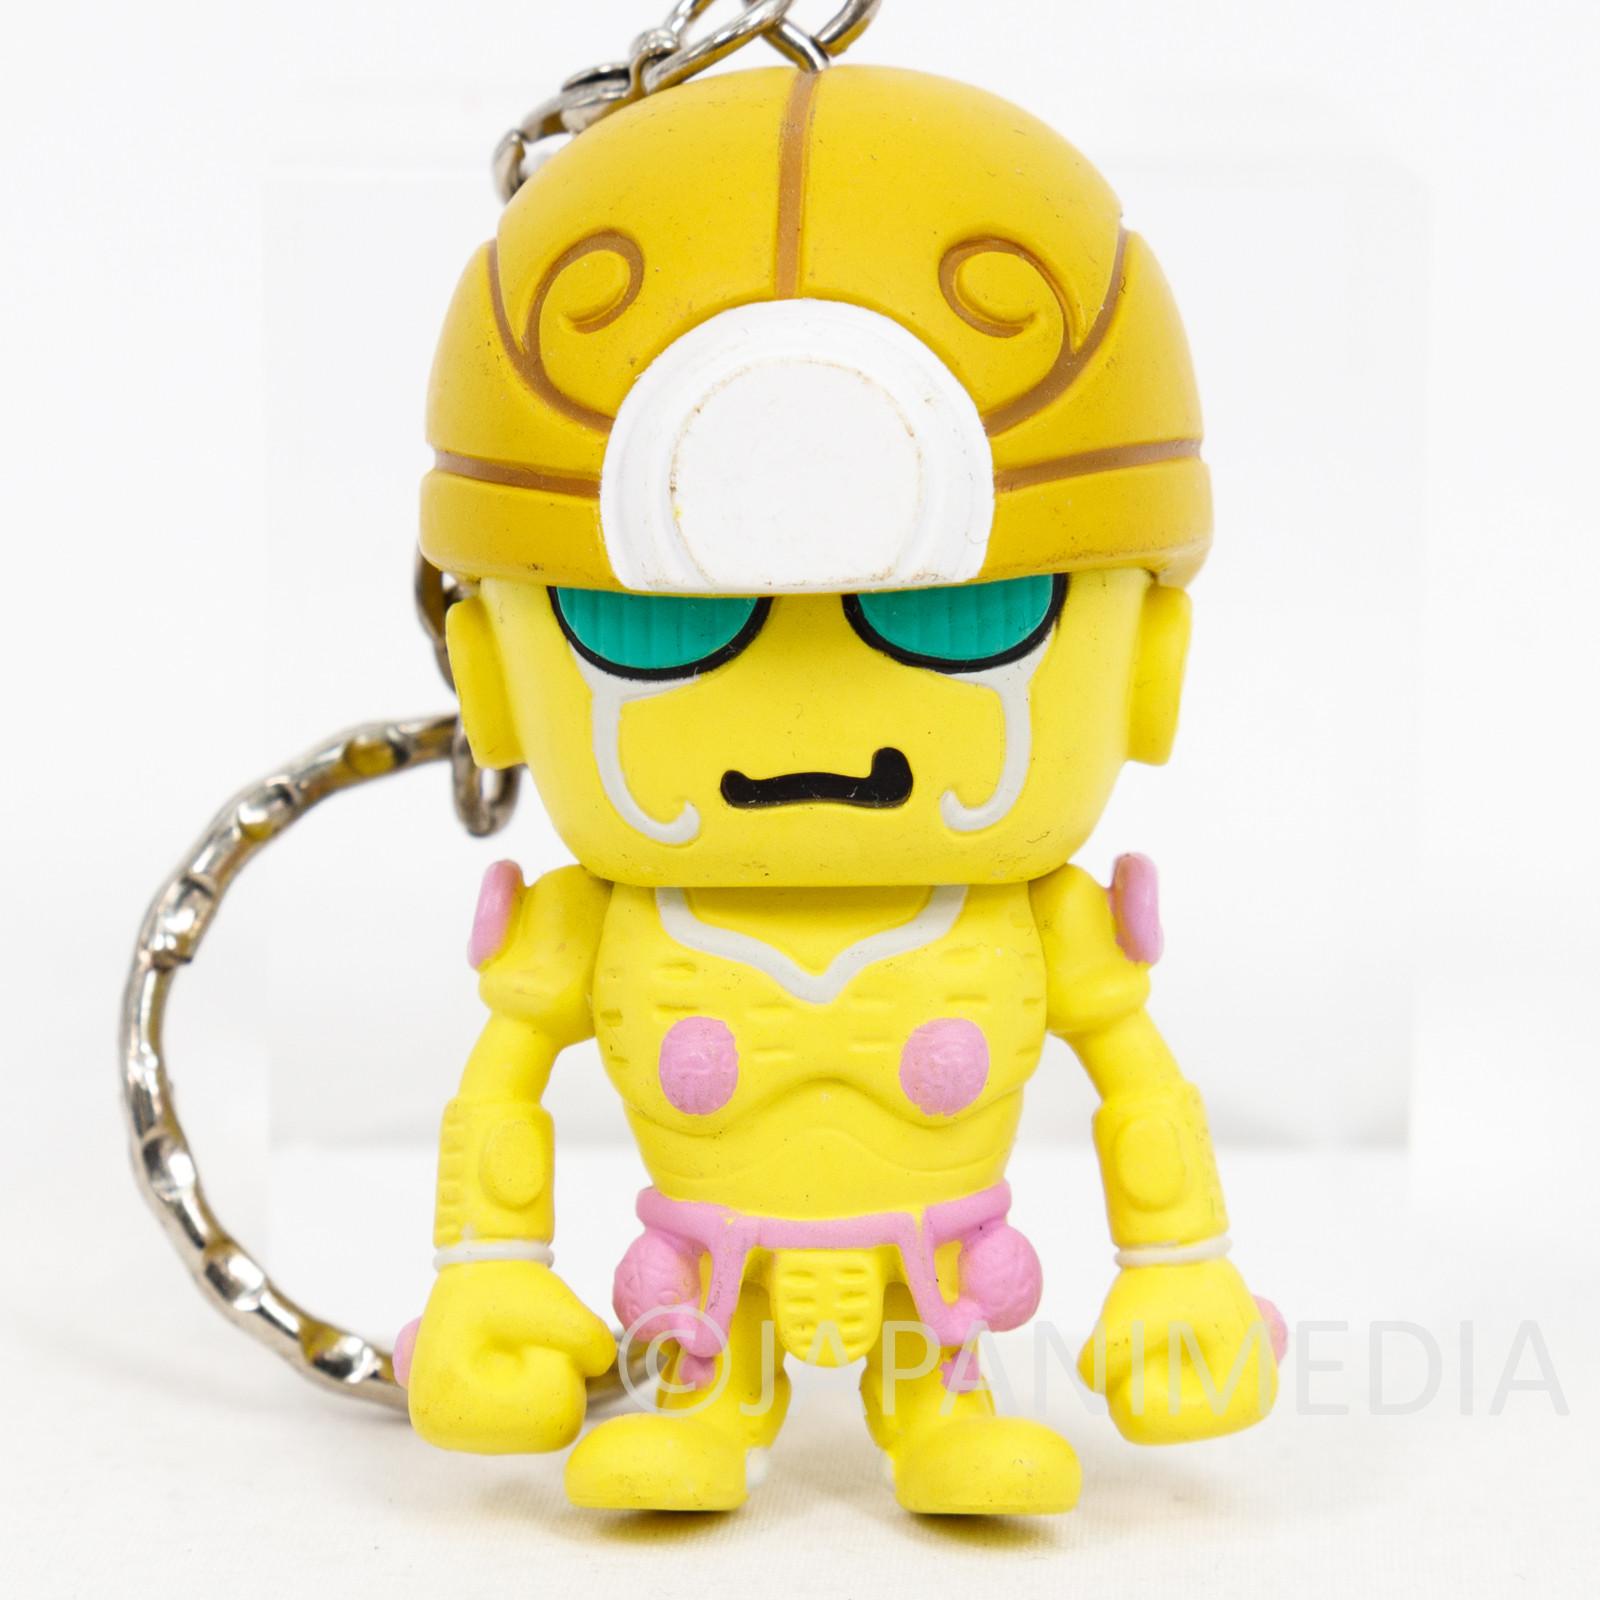 JoJo's Bizarre Adventure x Panson Works Gold Experience Figure Keychain